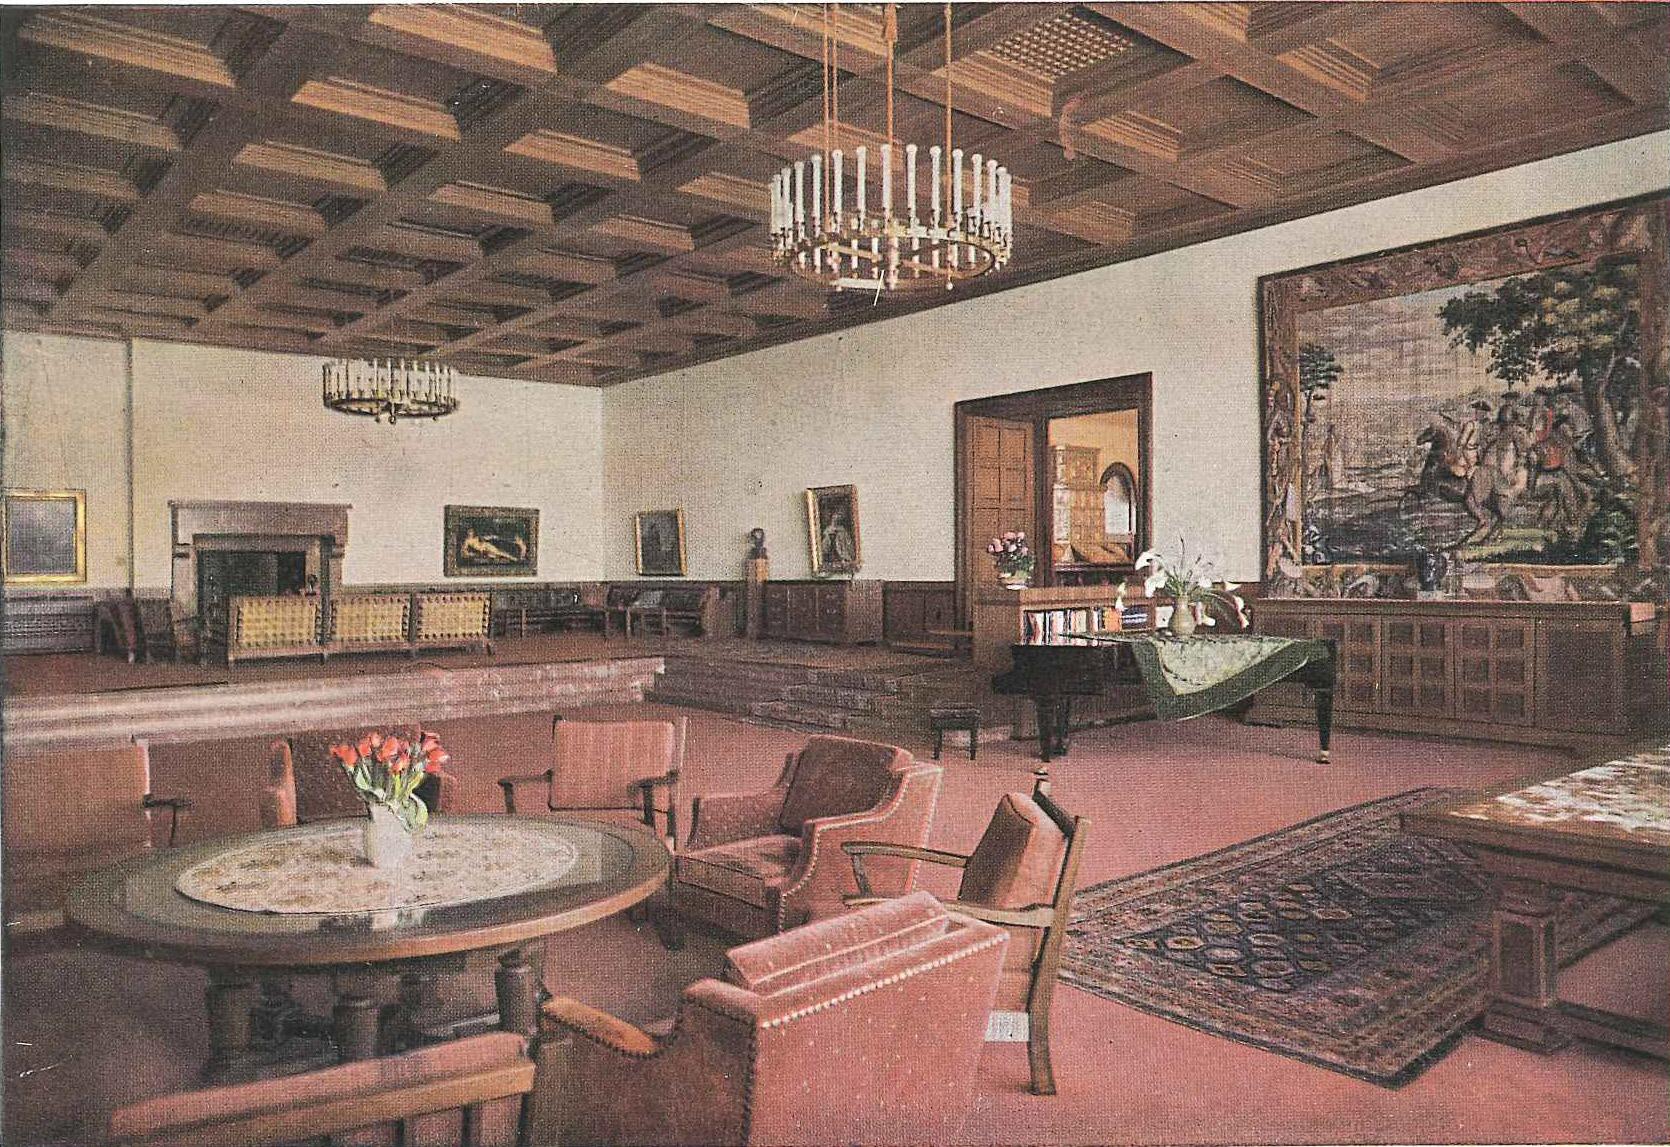 Heinrich Hoffmann, postcard of the Great Hall, 1936.